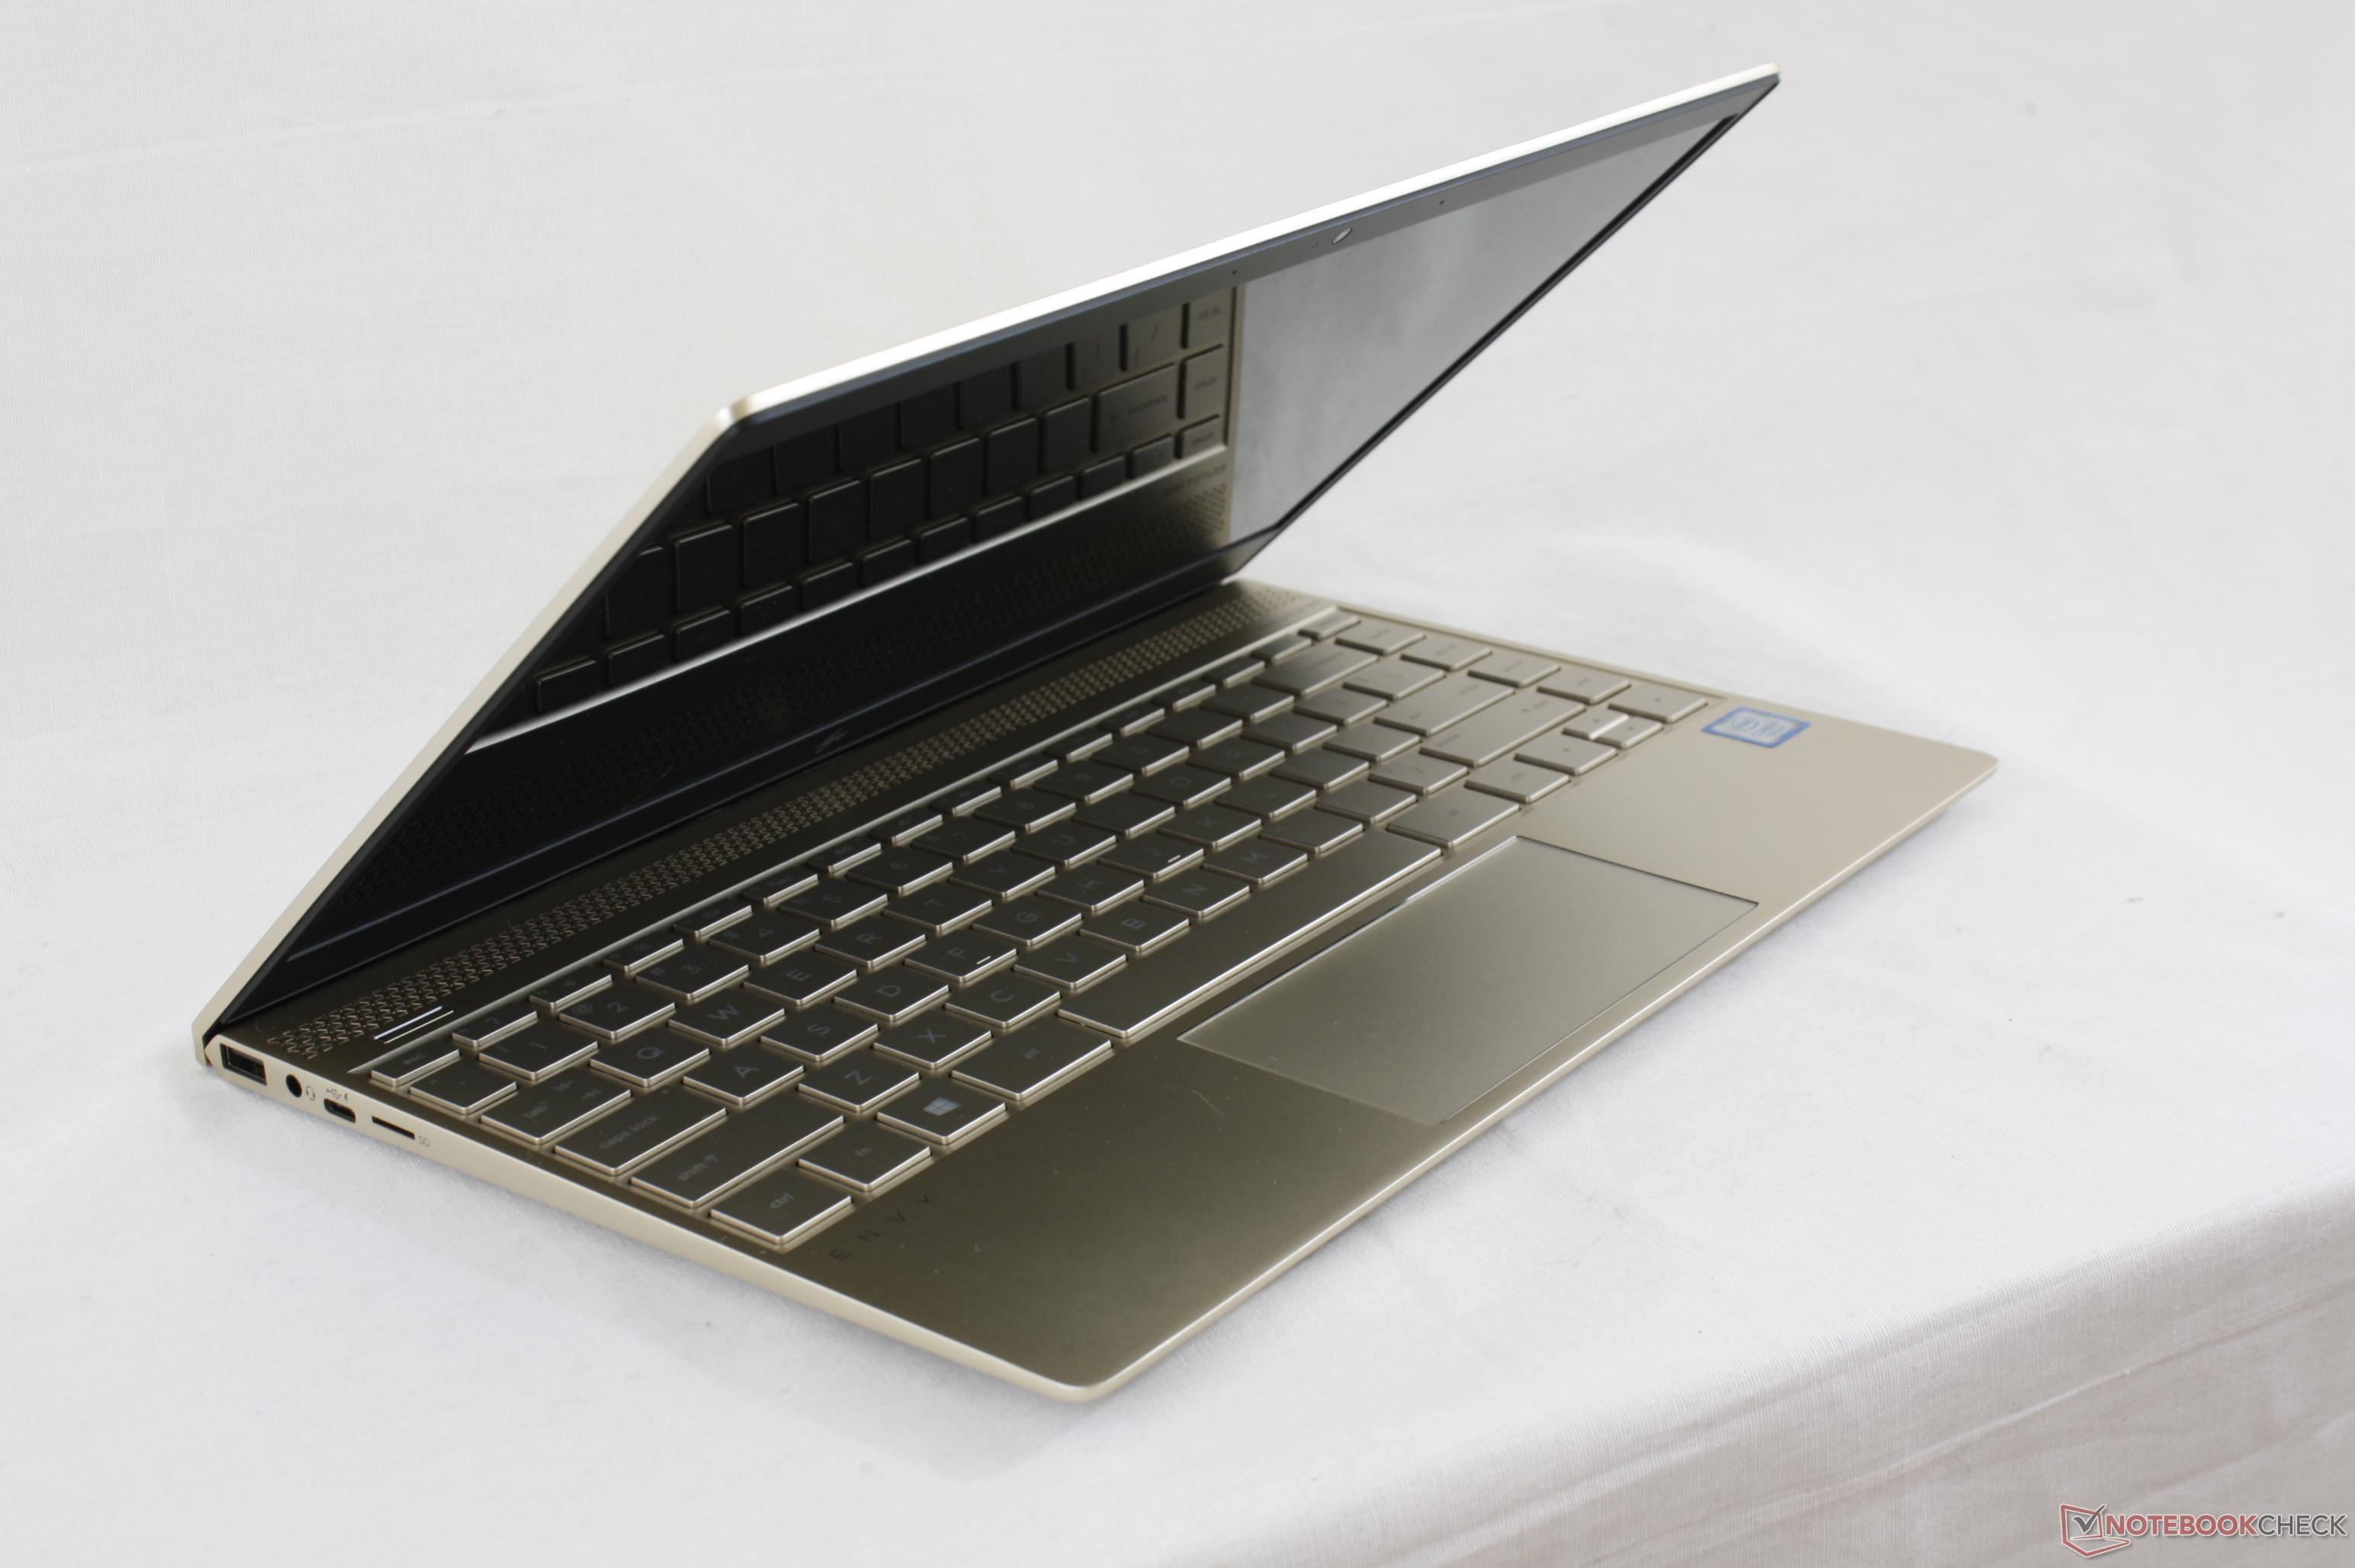 Hp Envy 13 Ad065nr I5 7200u Fhd Laptop Rvid Rtkels Charger Adaptor Acer Aspire 1148 Full Resolution